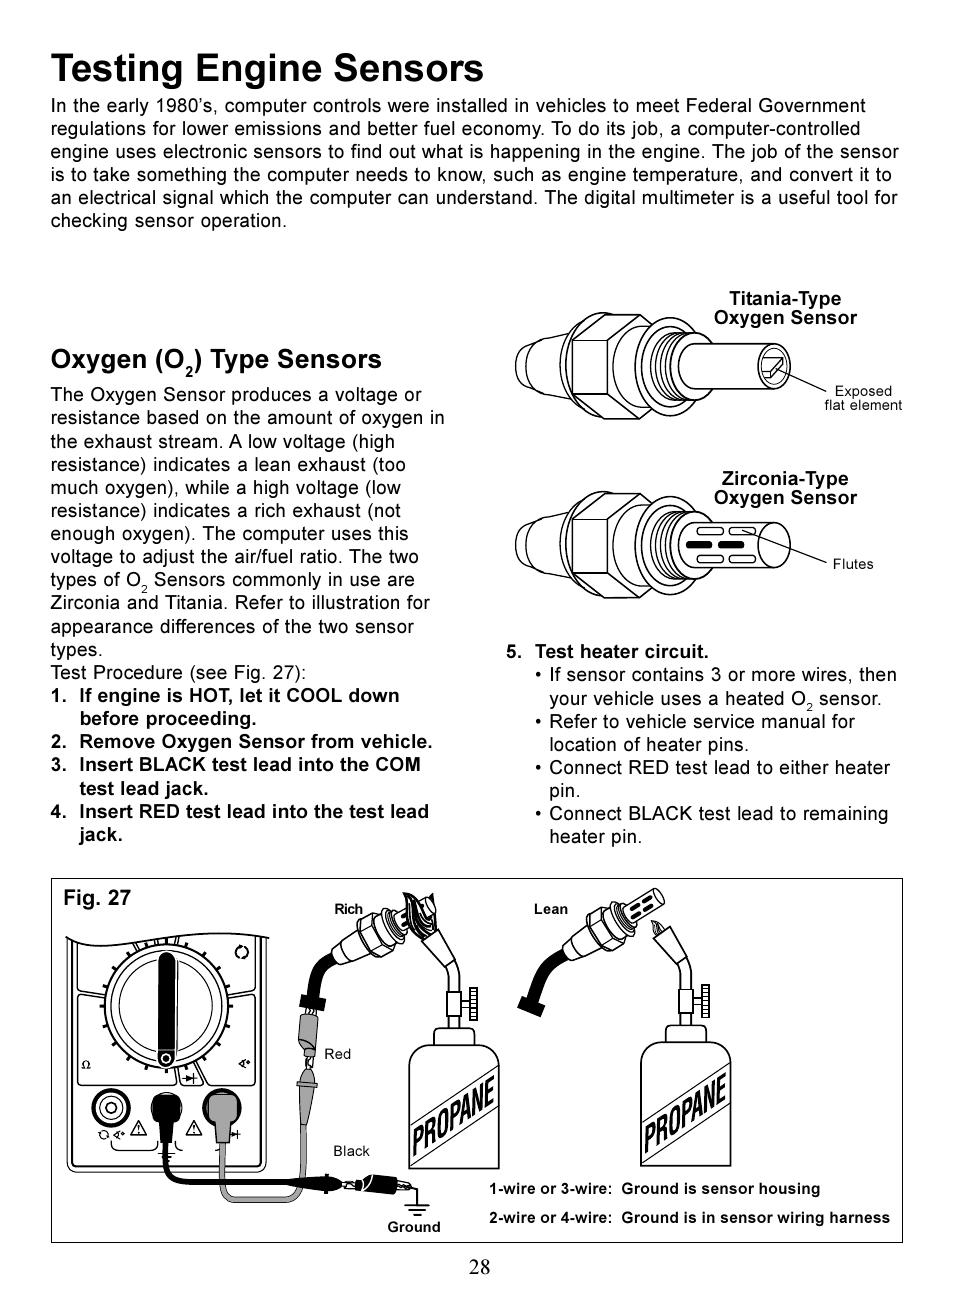 testing engine sensors oxygen o type sensors actron digital rh manualsdir com Actron Meters Actron Professional Series Voltmeter Manual